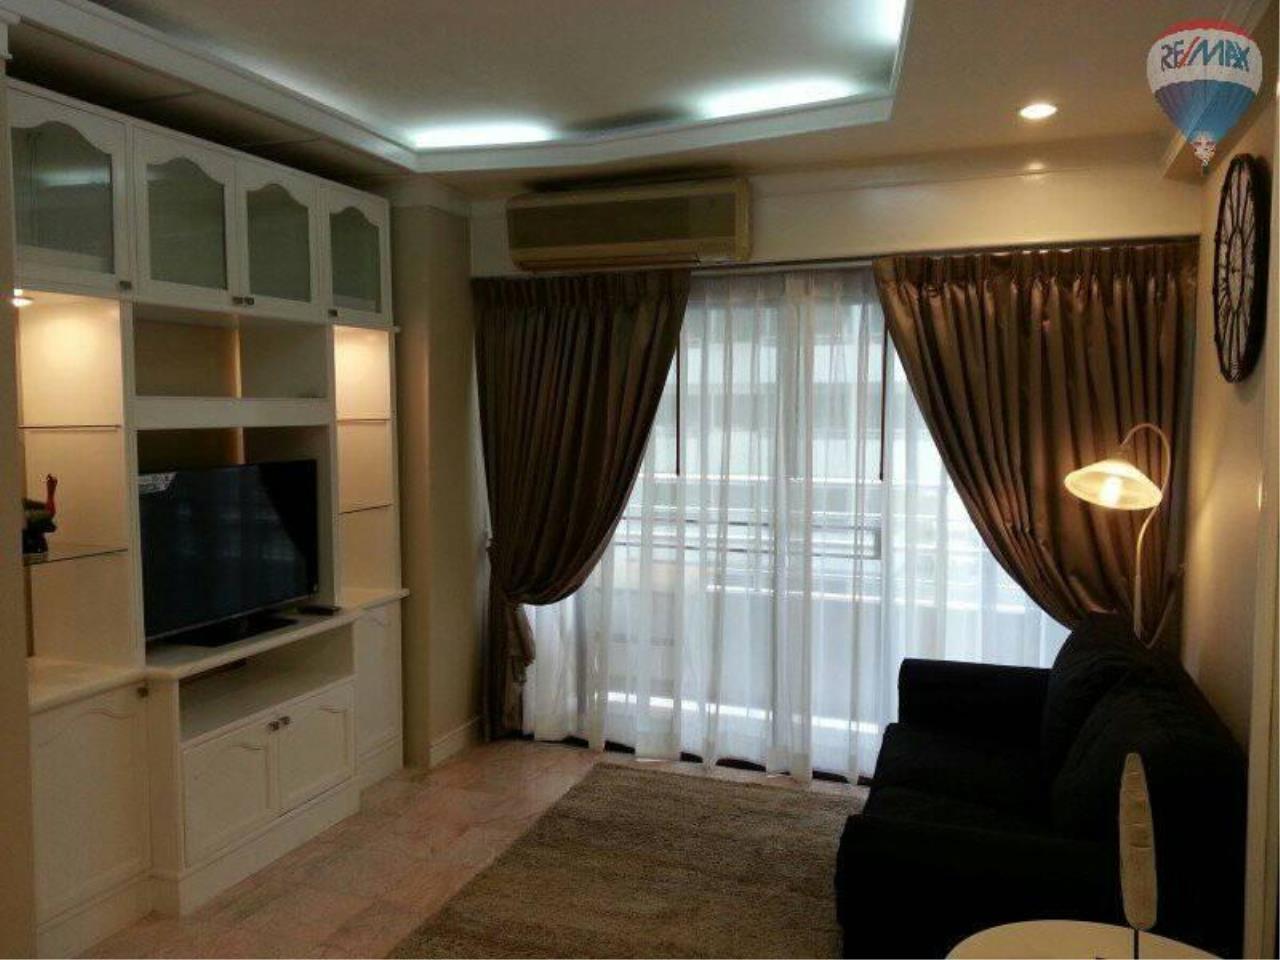 RE/MAX Properties Agency's 1 Bedroom 60 Sq.m for RENT at Saranjai Mansion,Sukhumvit Soi 4 (Nana) 3